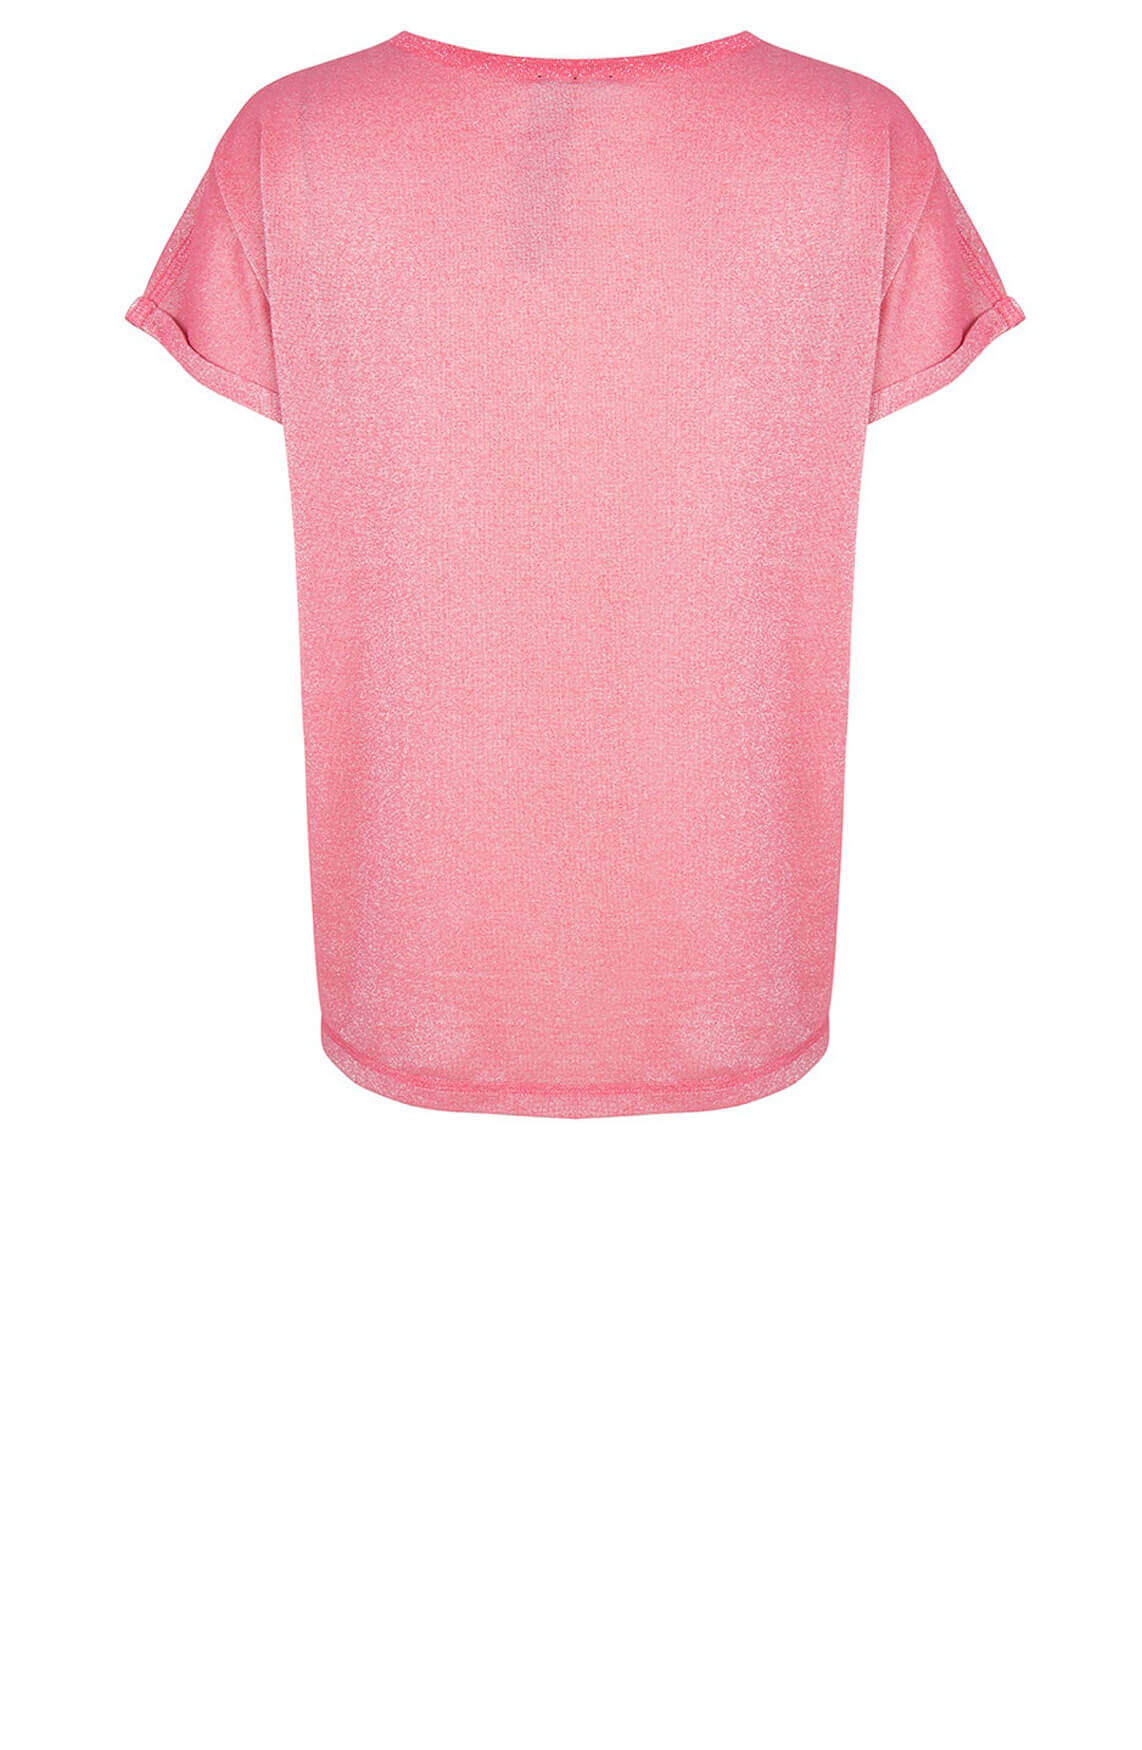 Jane Lushka Dames Hope glitter shirt roze